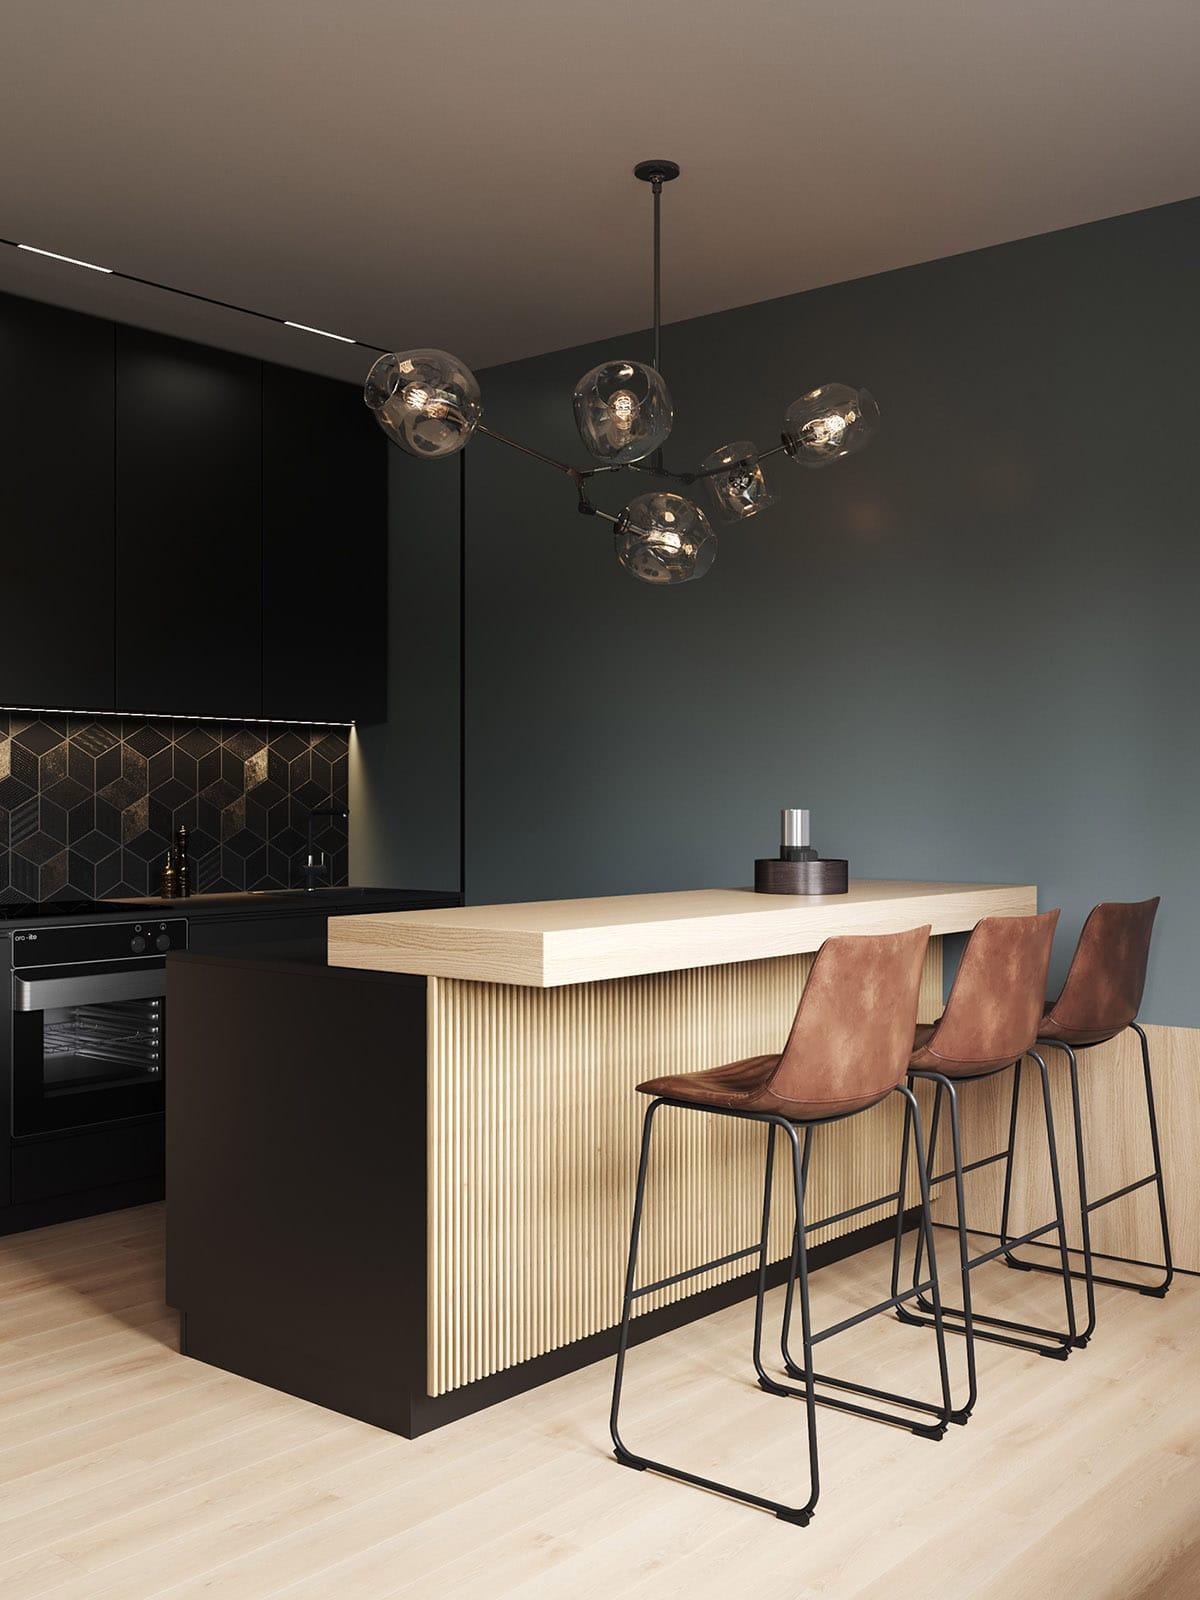 Brown-kitchen-bar-stools